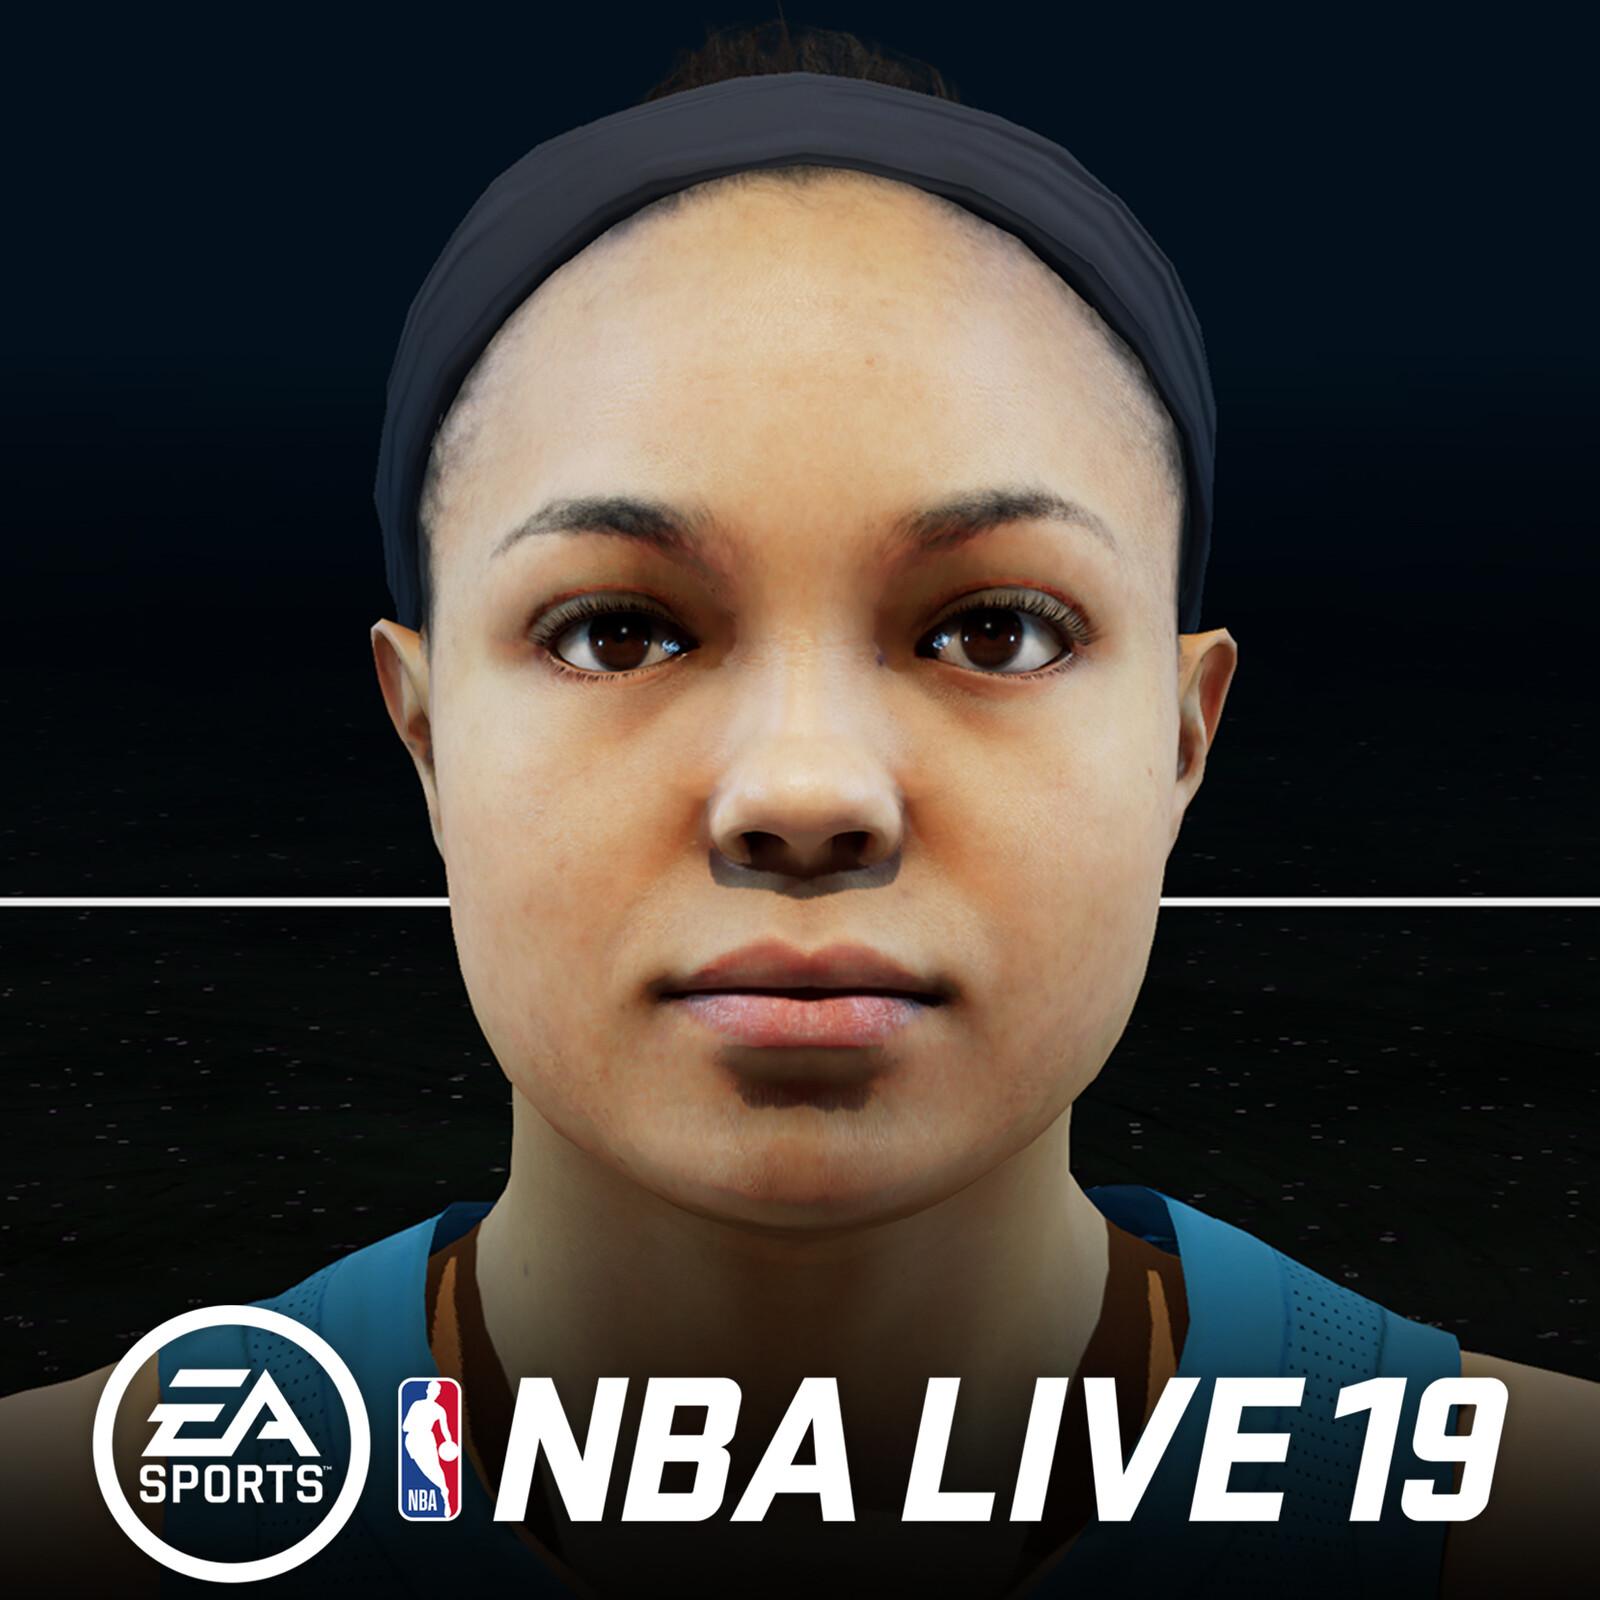 NBA LIVE 19 - Napheesa Collier